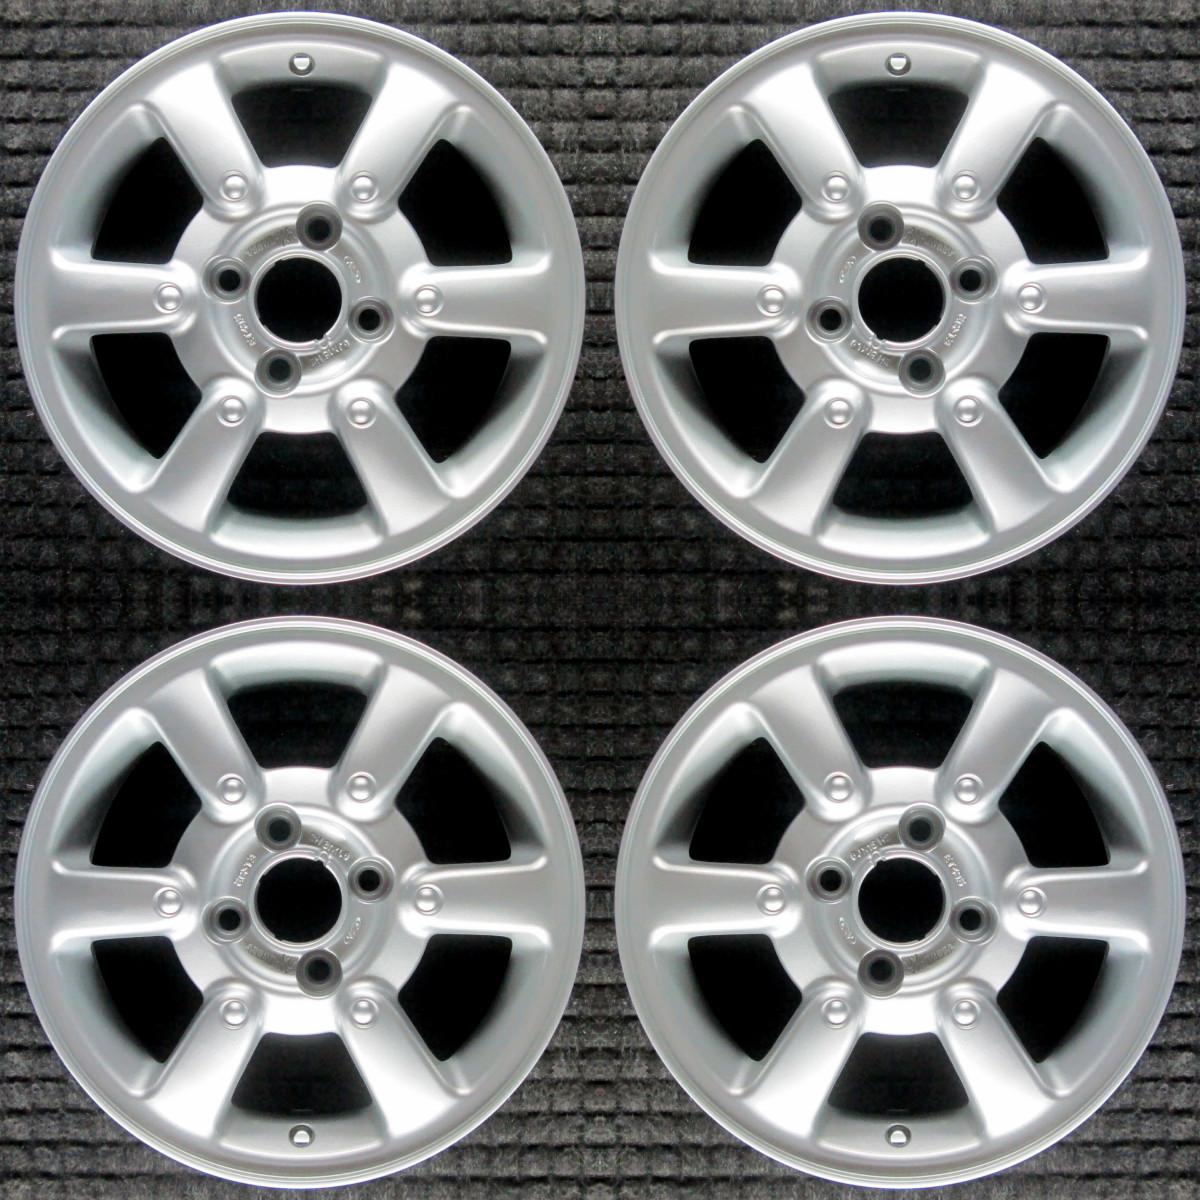 ford contour all silver 15 oem wheel set 1996 to 2000 ebay ebay